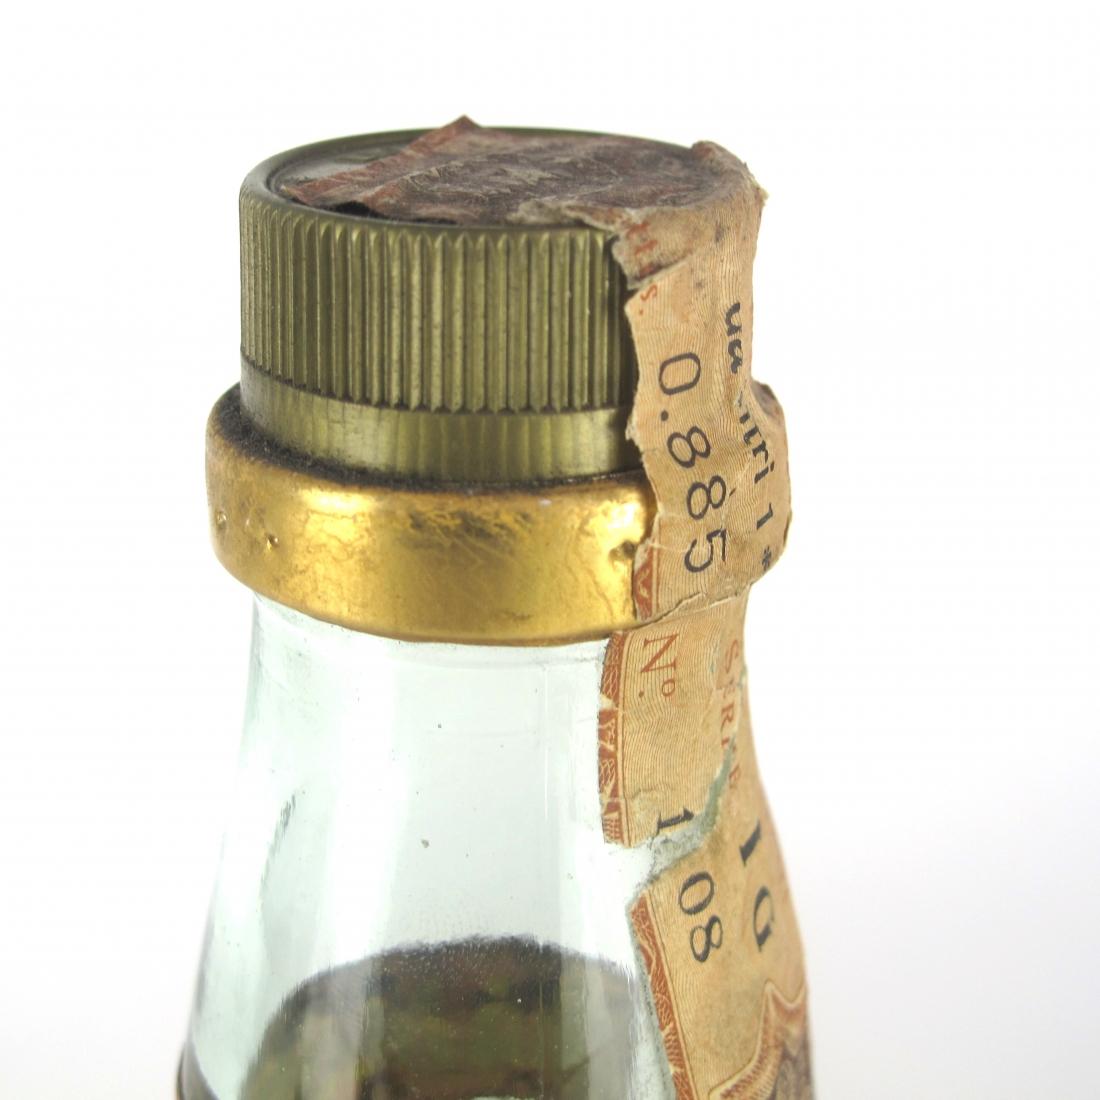 Sarti Biancosarti Amaro 1 Litre 1970s